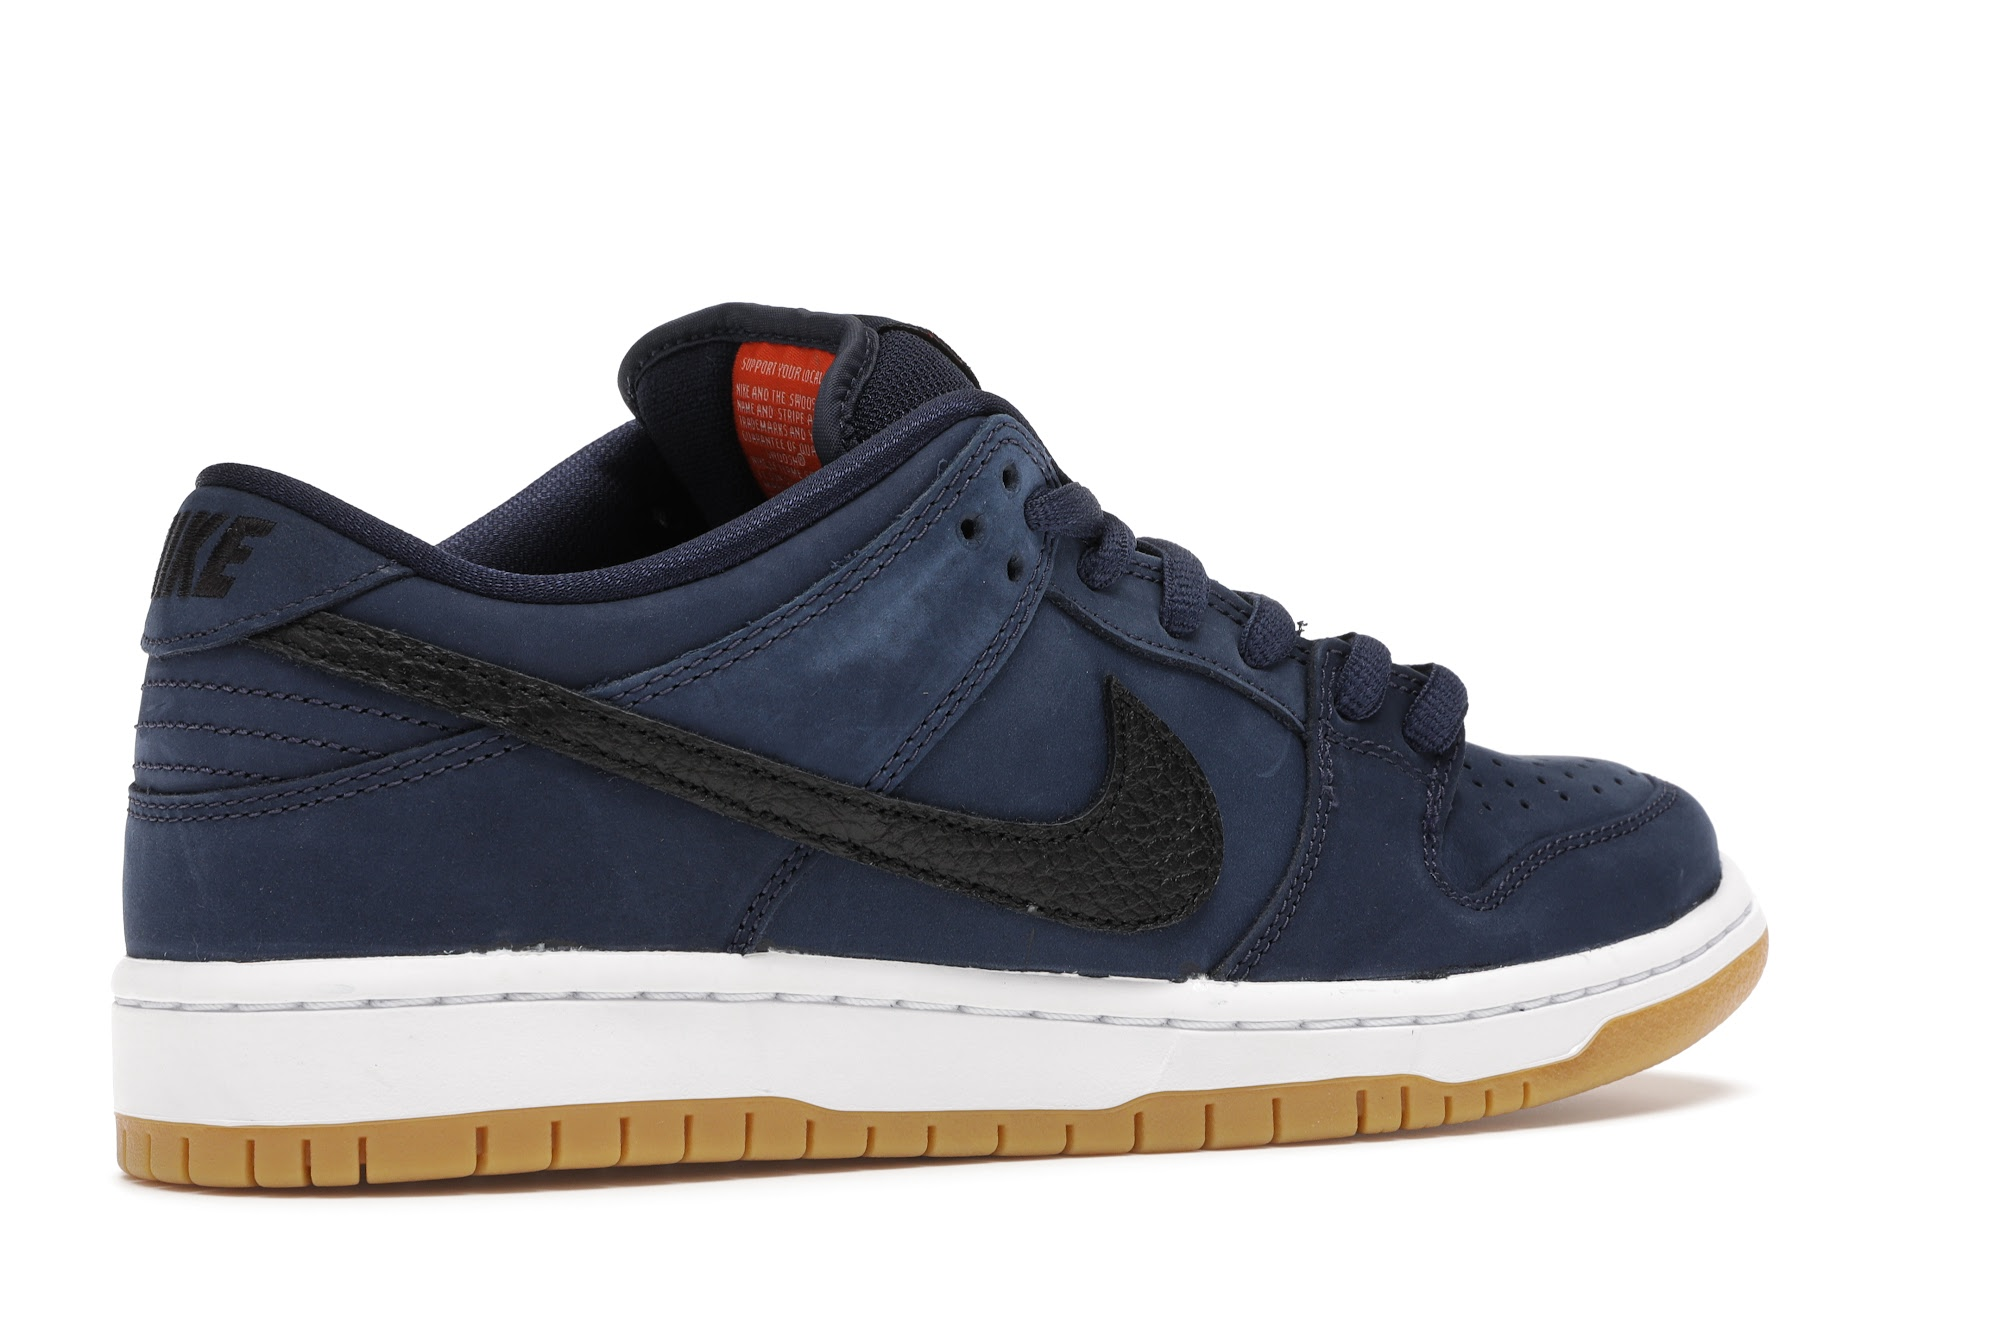 Nike SB Dunk Low Navy Black Gum